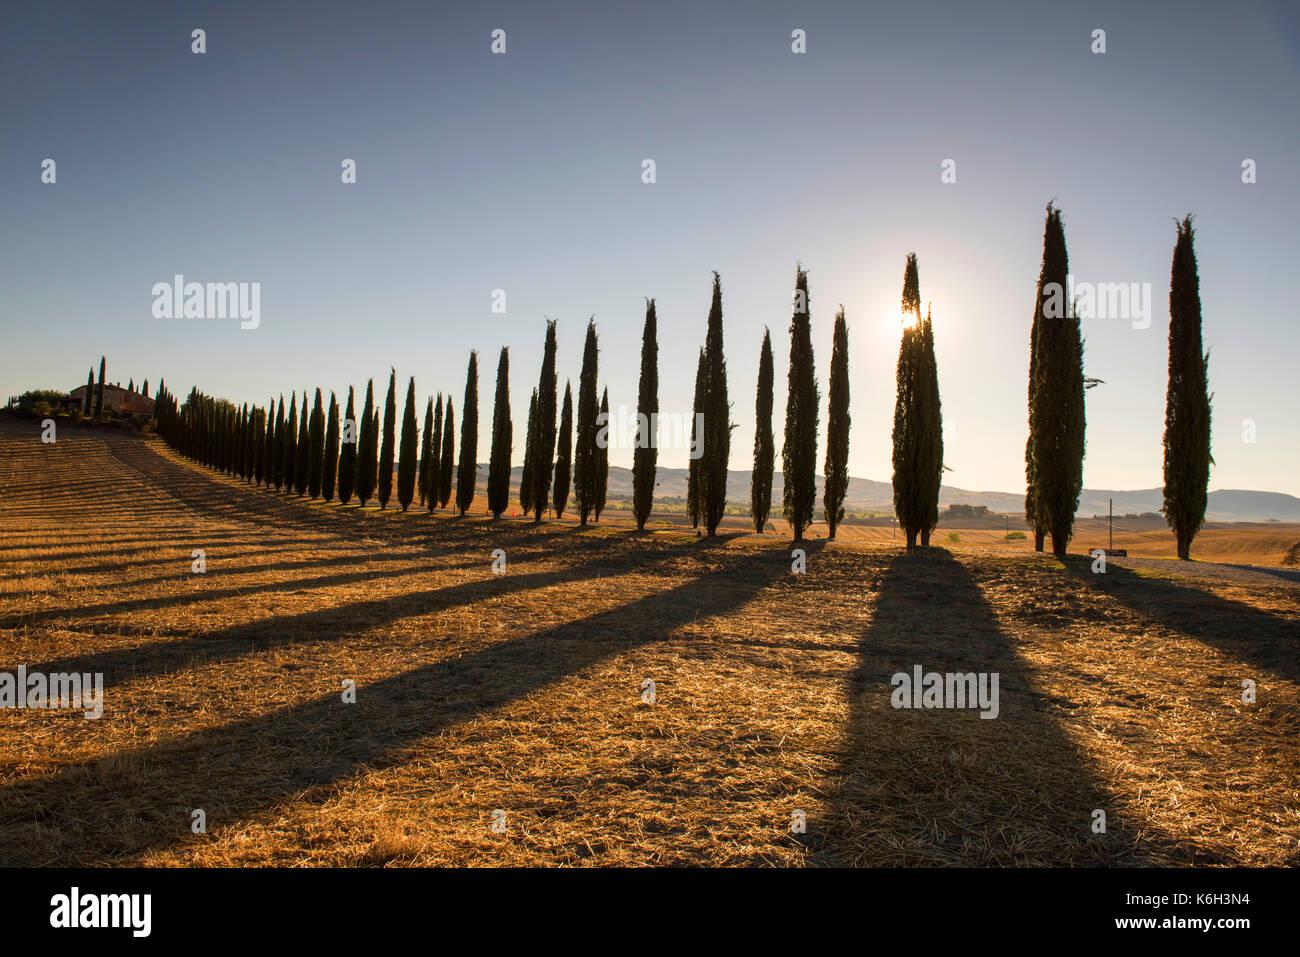 https://c8.alamy.com/comp/K6H3N4/early-morning-light-and-shadows-at-poggio-covili-near-bagno-vignoni-K6H3N4.jpg